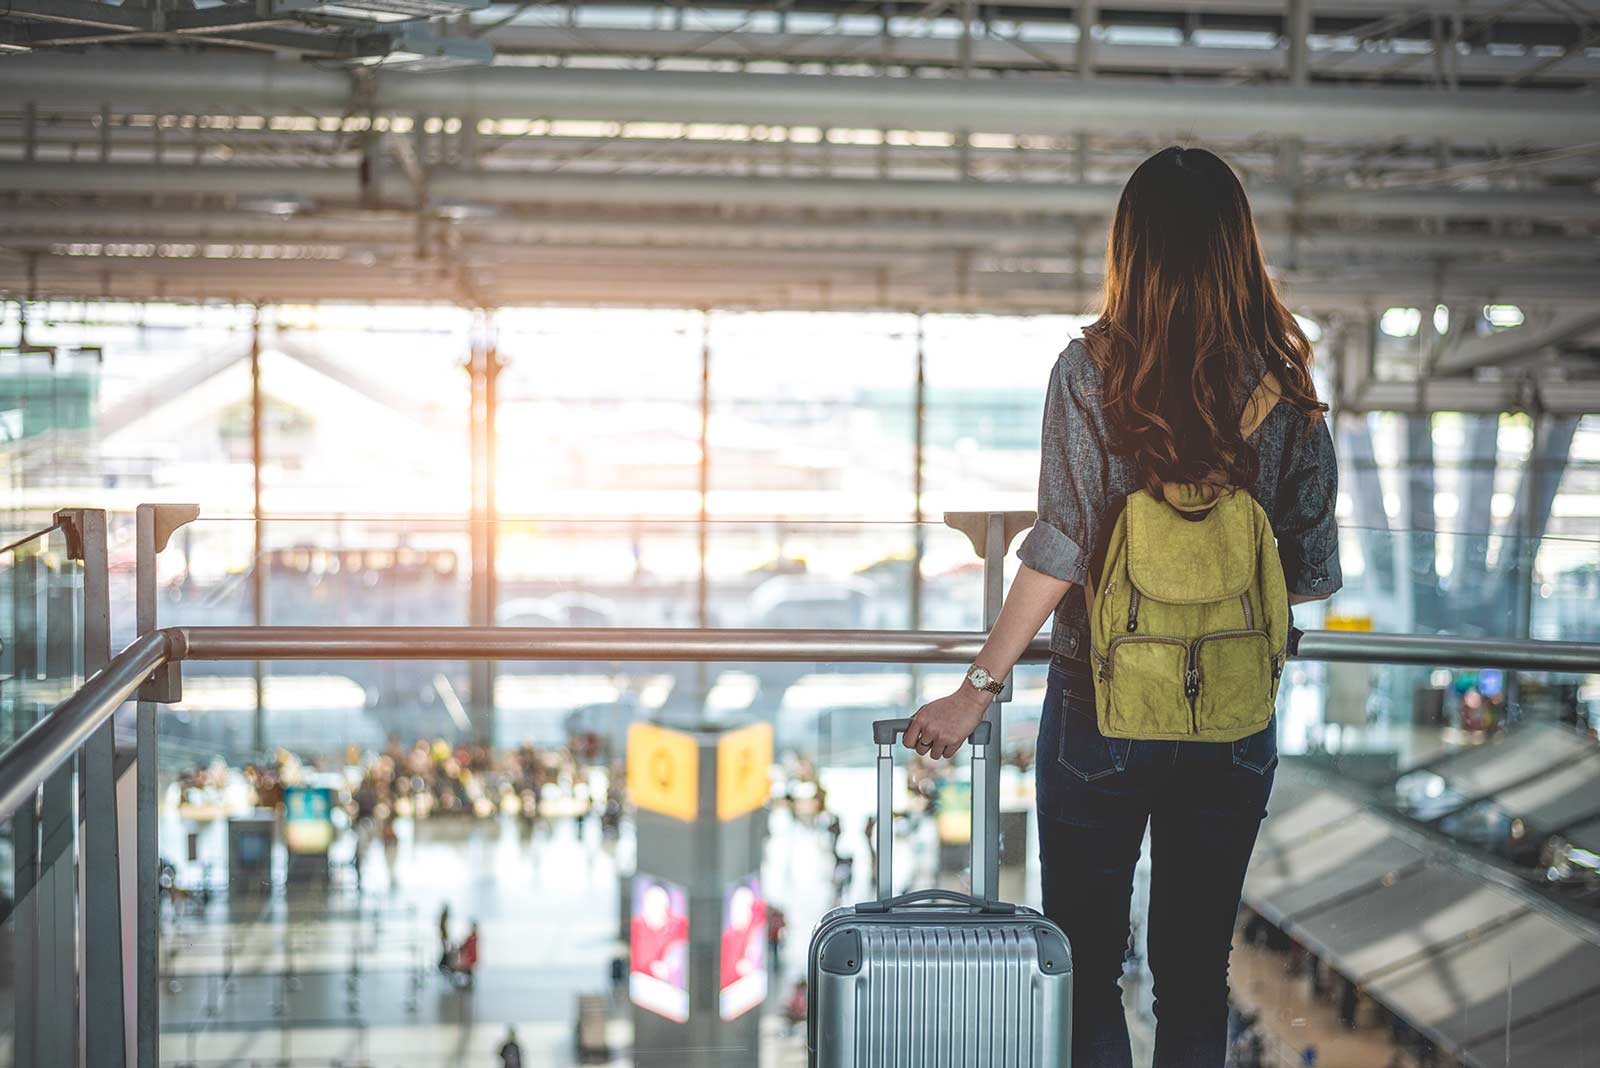 Chica viajera